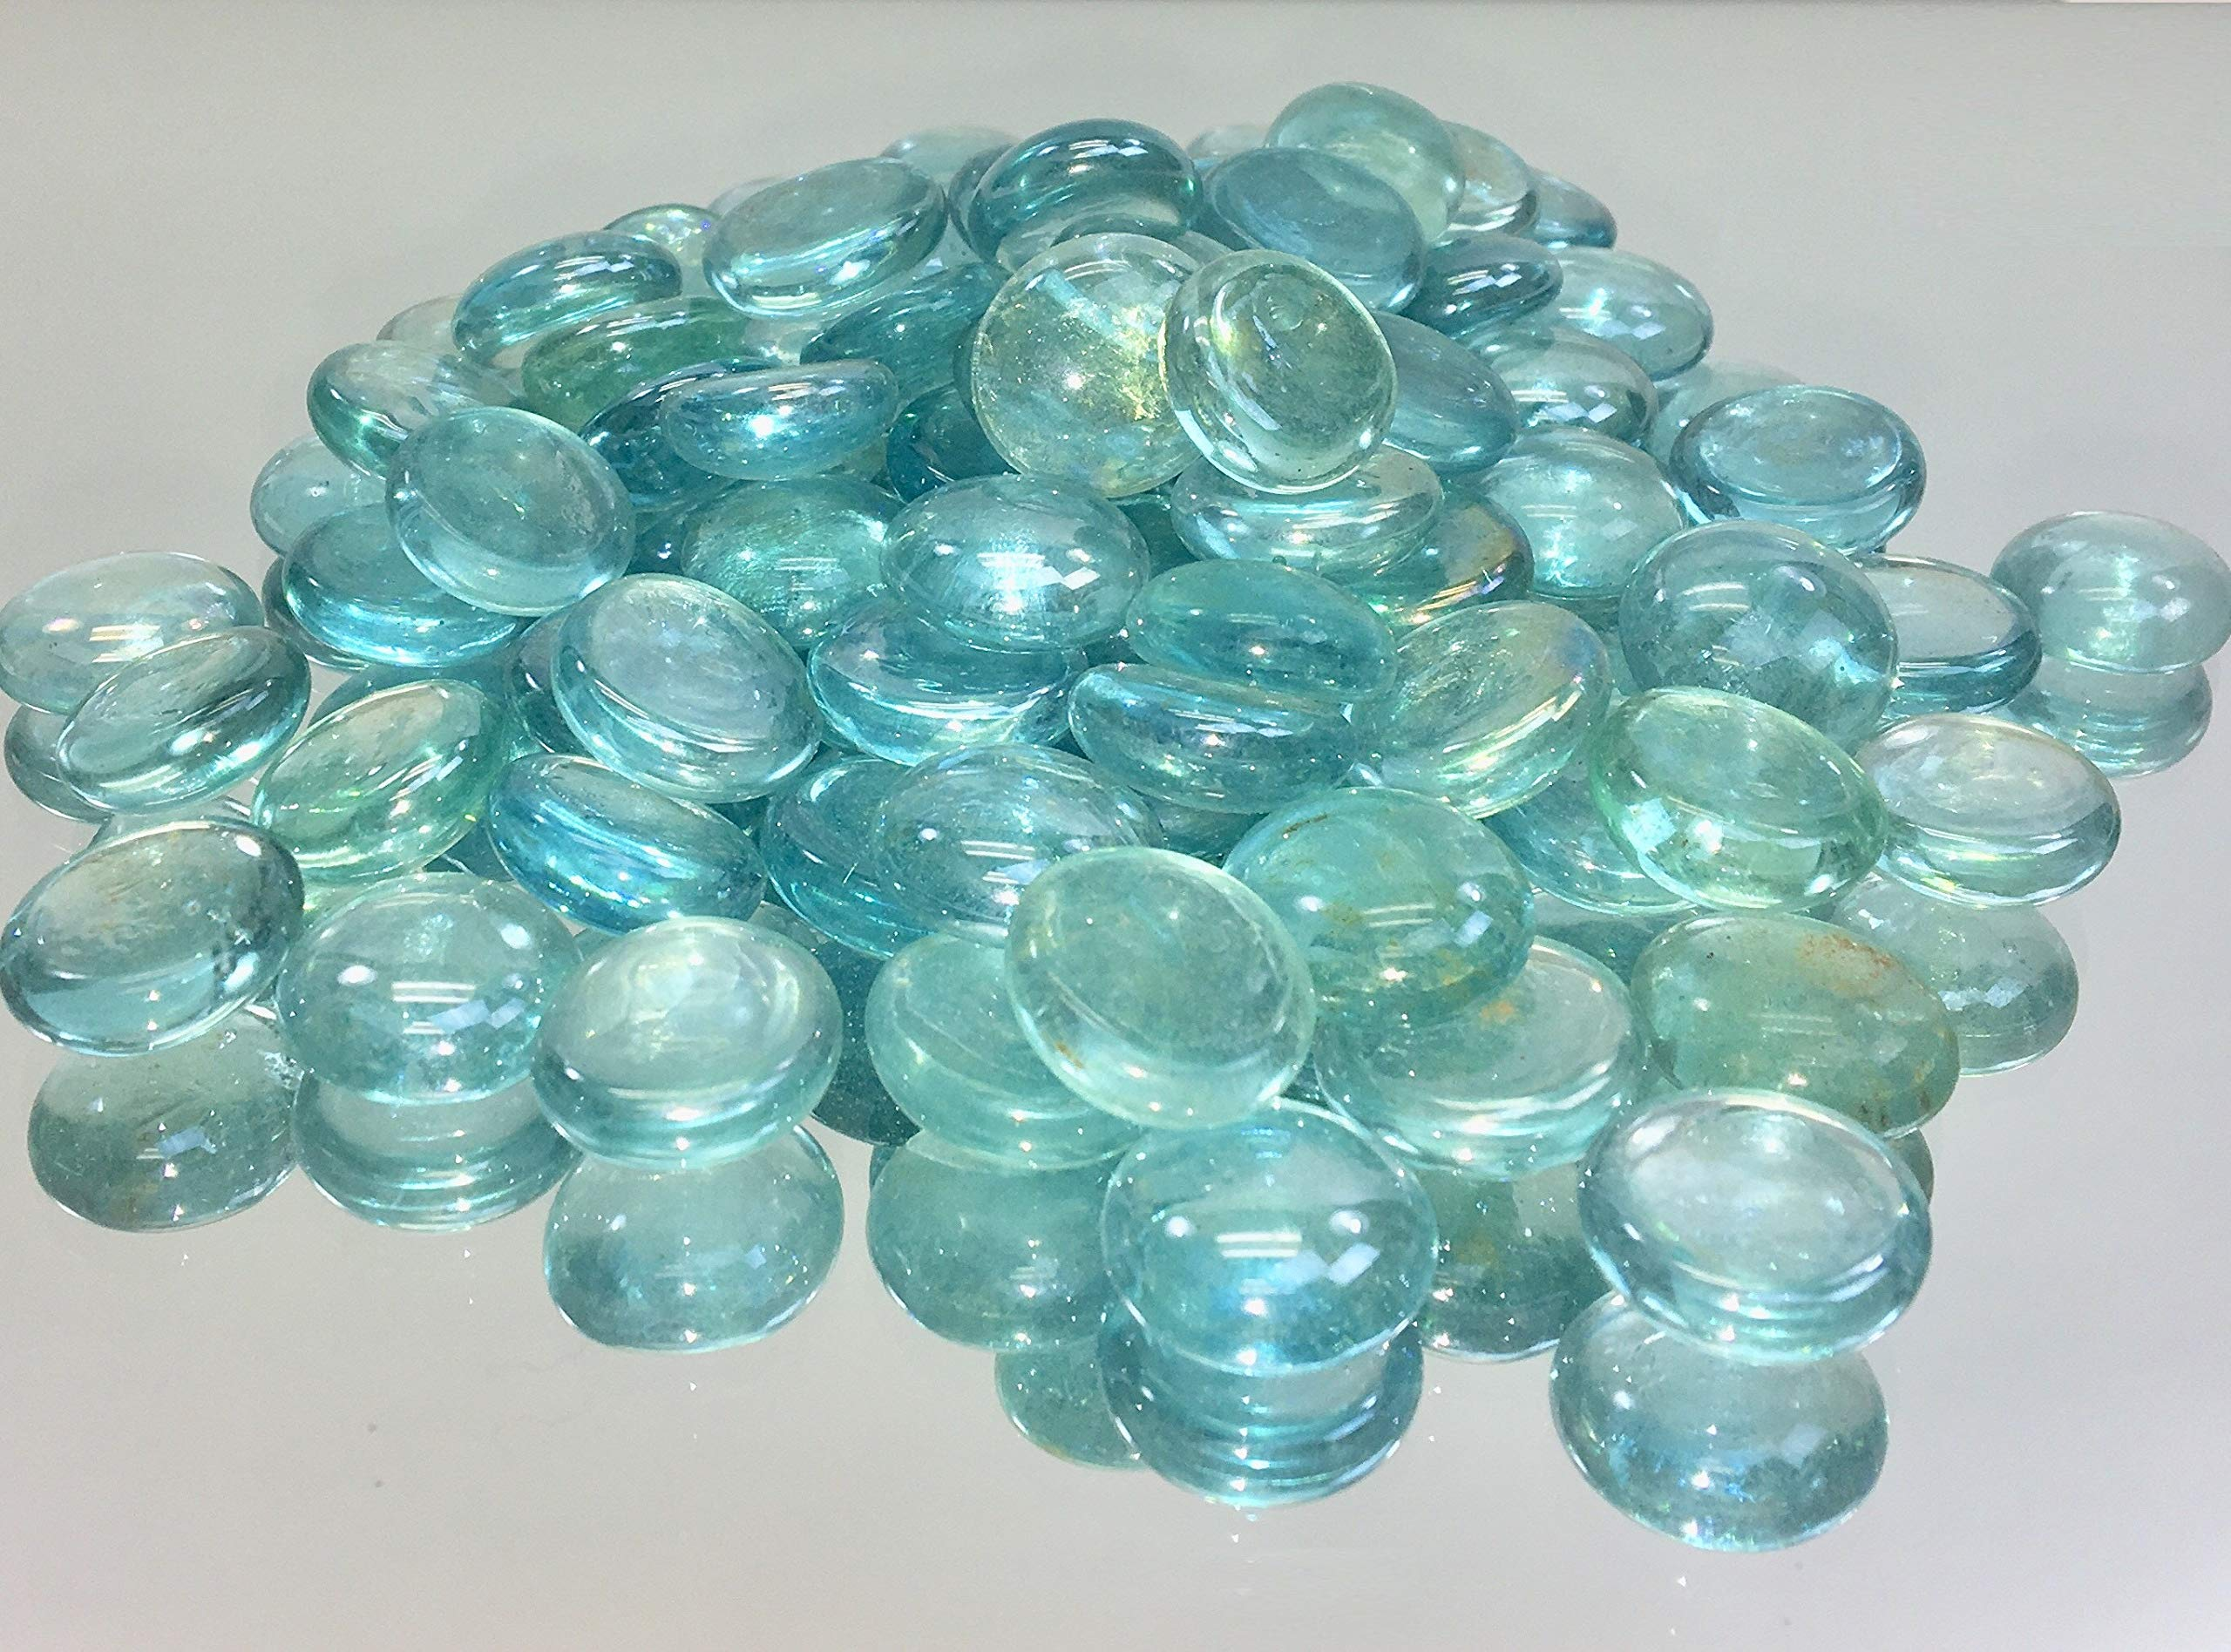 WGVI 20 Pounds Flat Bottom Marbles Vase Filler Glass Gems - Aqua by WGVI